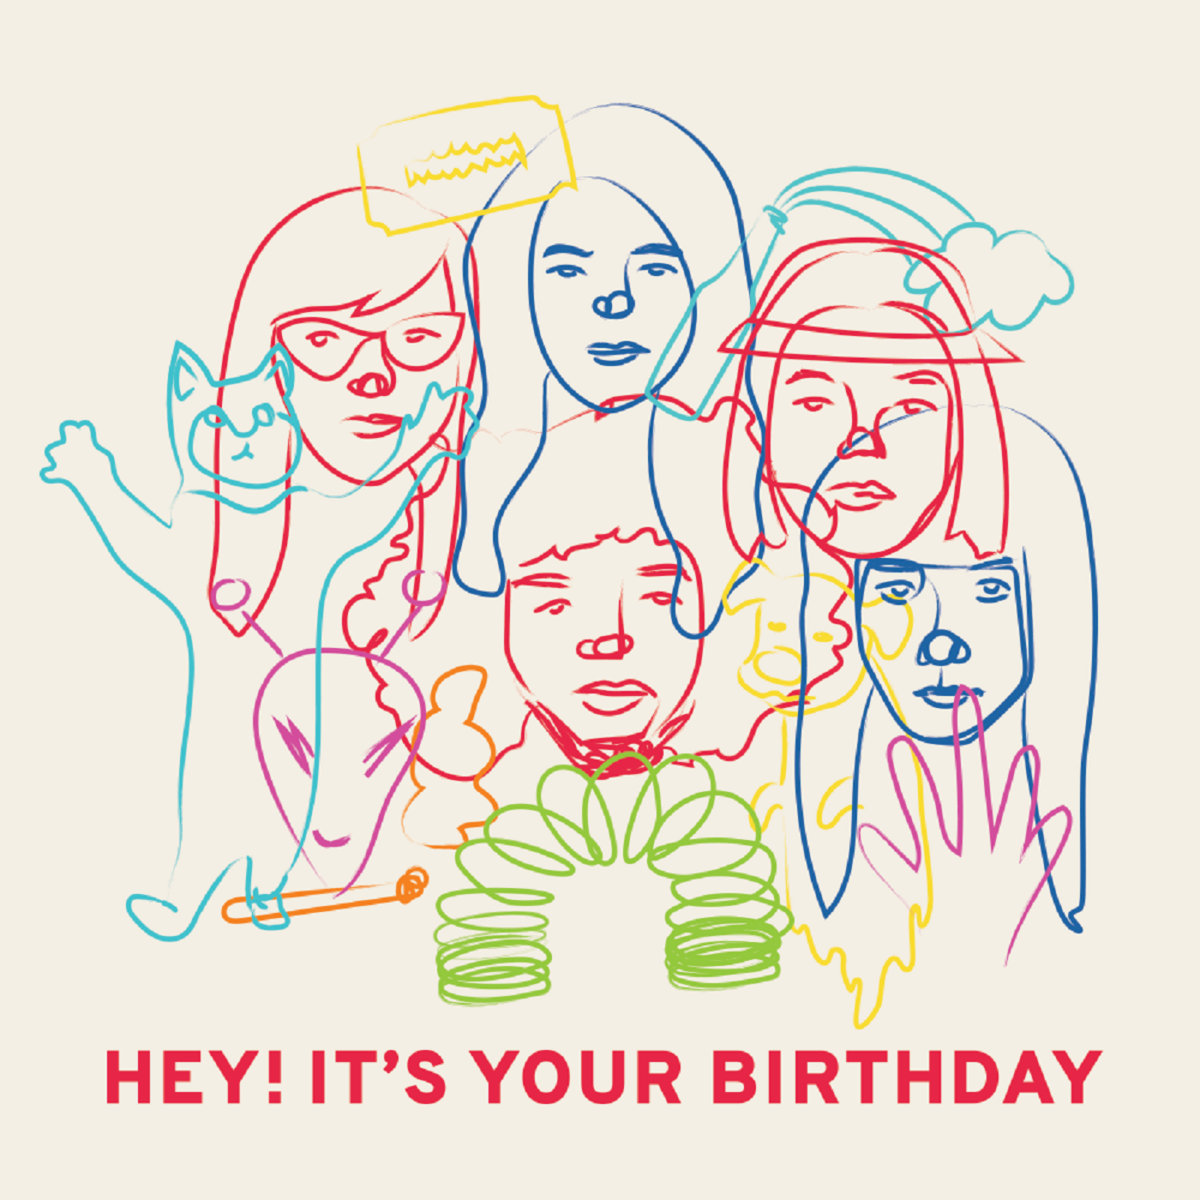 90s Bedroom Jams Hey It S Your Birthday